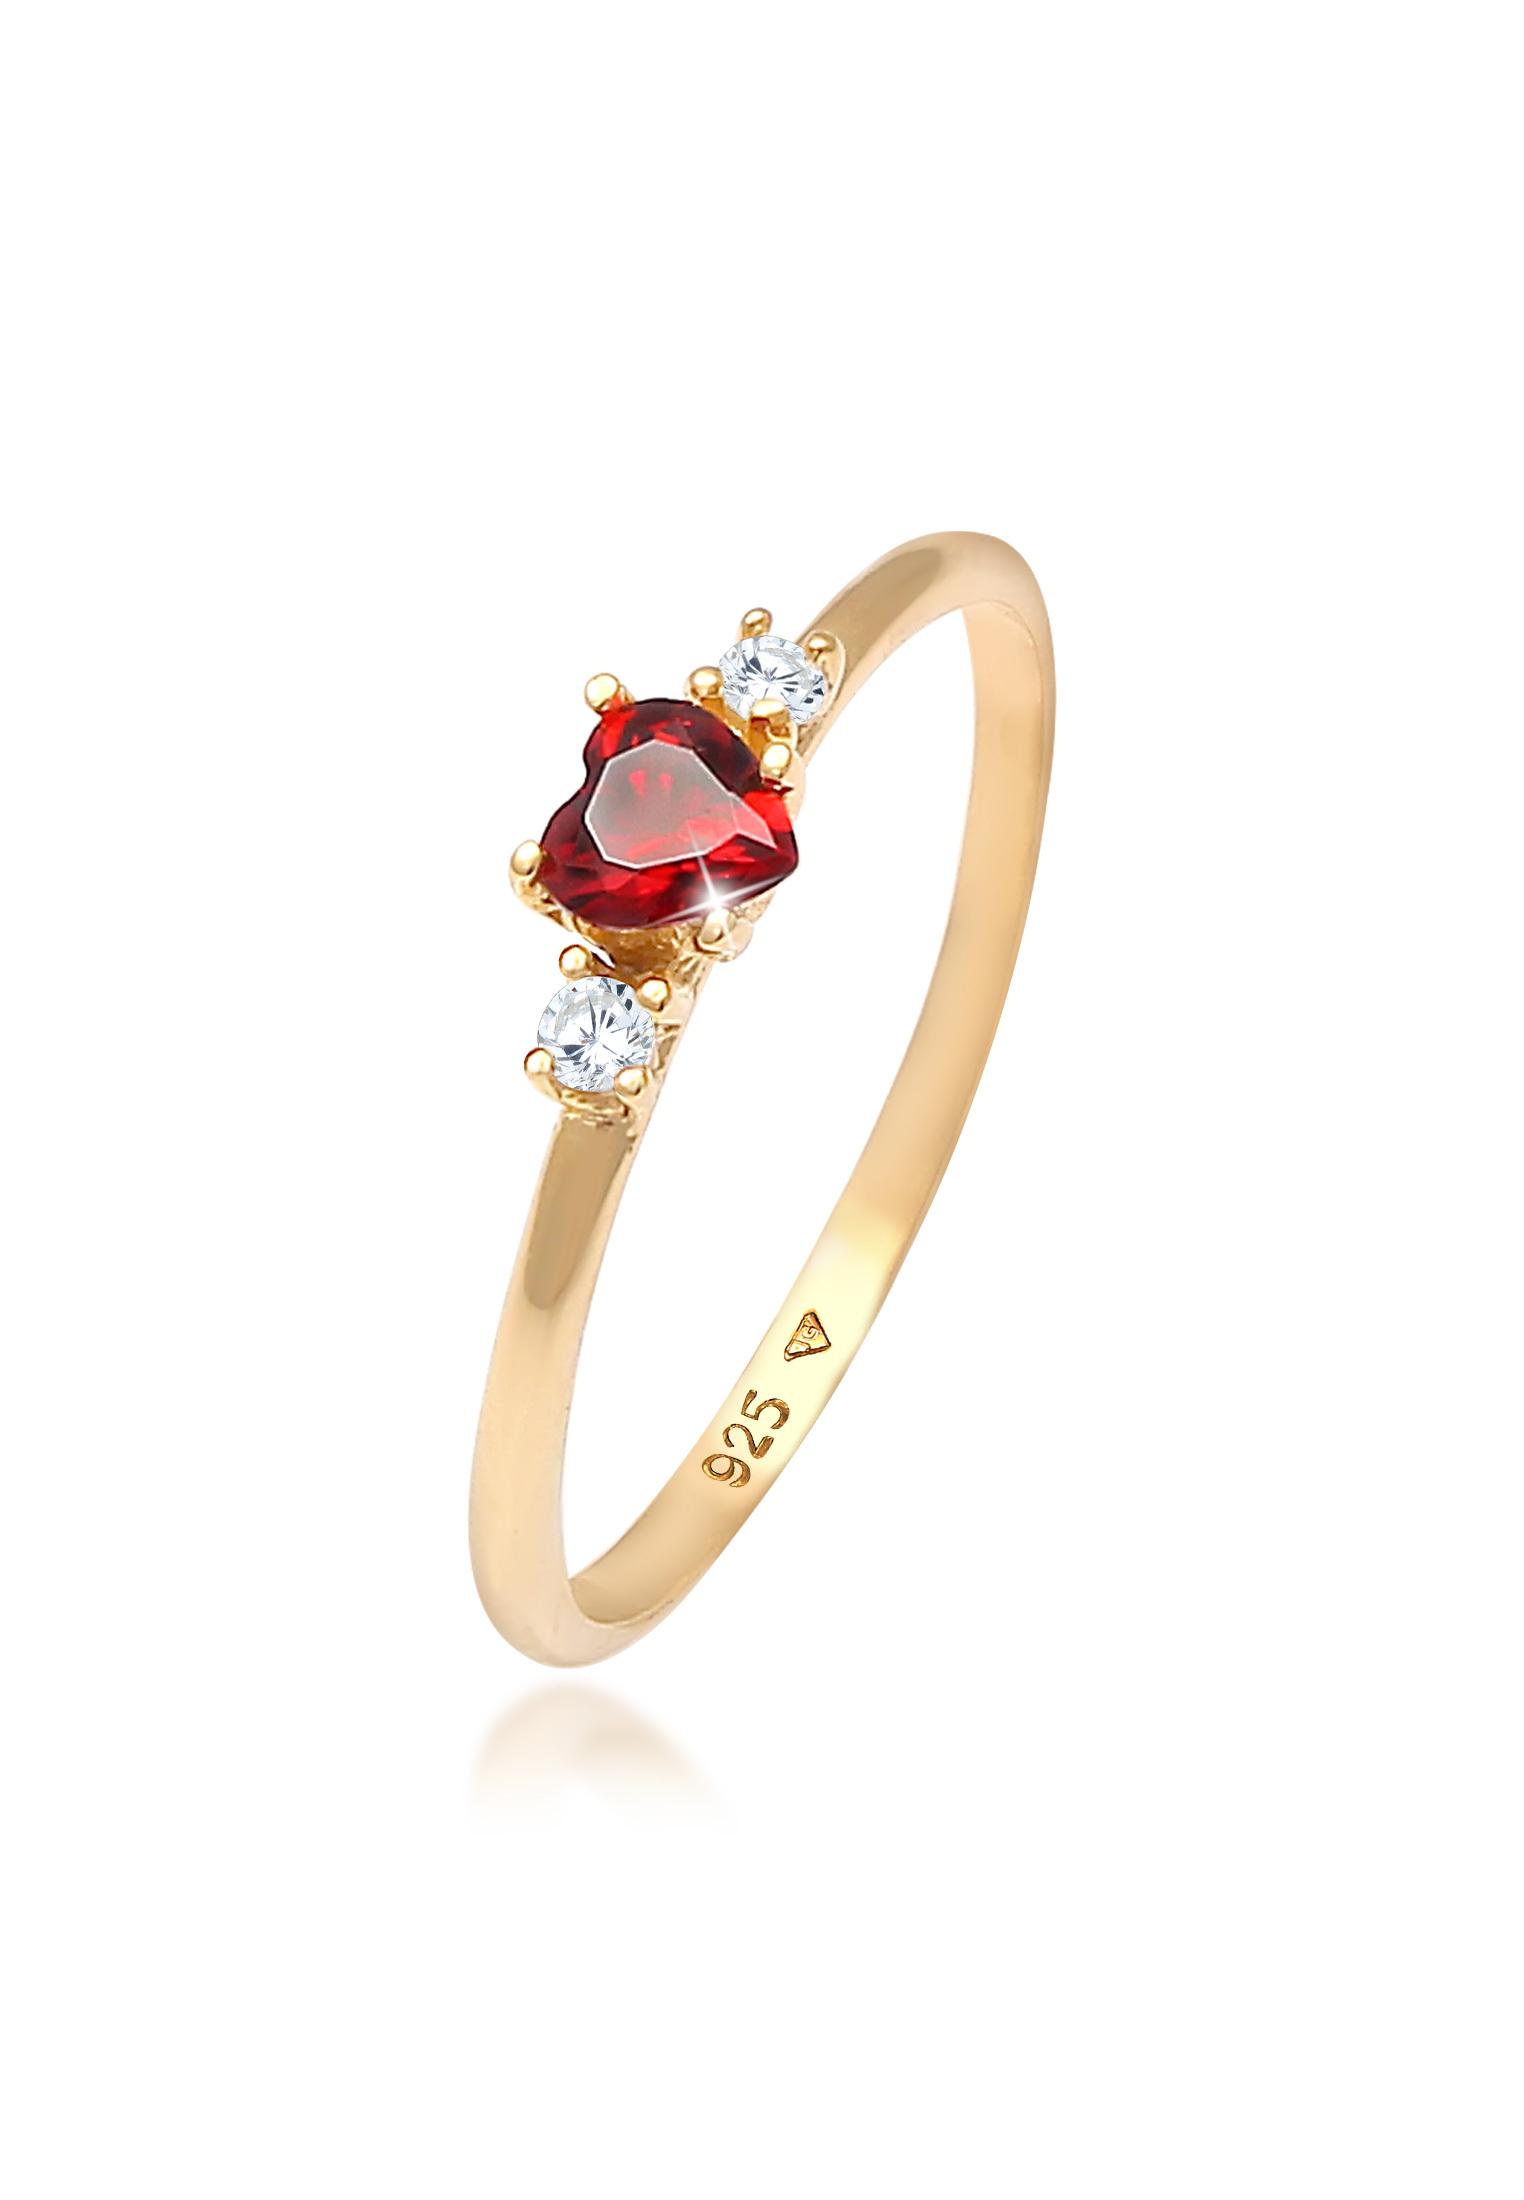 Ring Herz   Zirkonia ( Rot )   925 Sterling Silber vergoldet